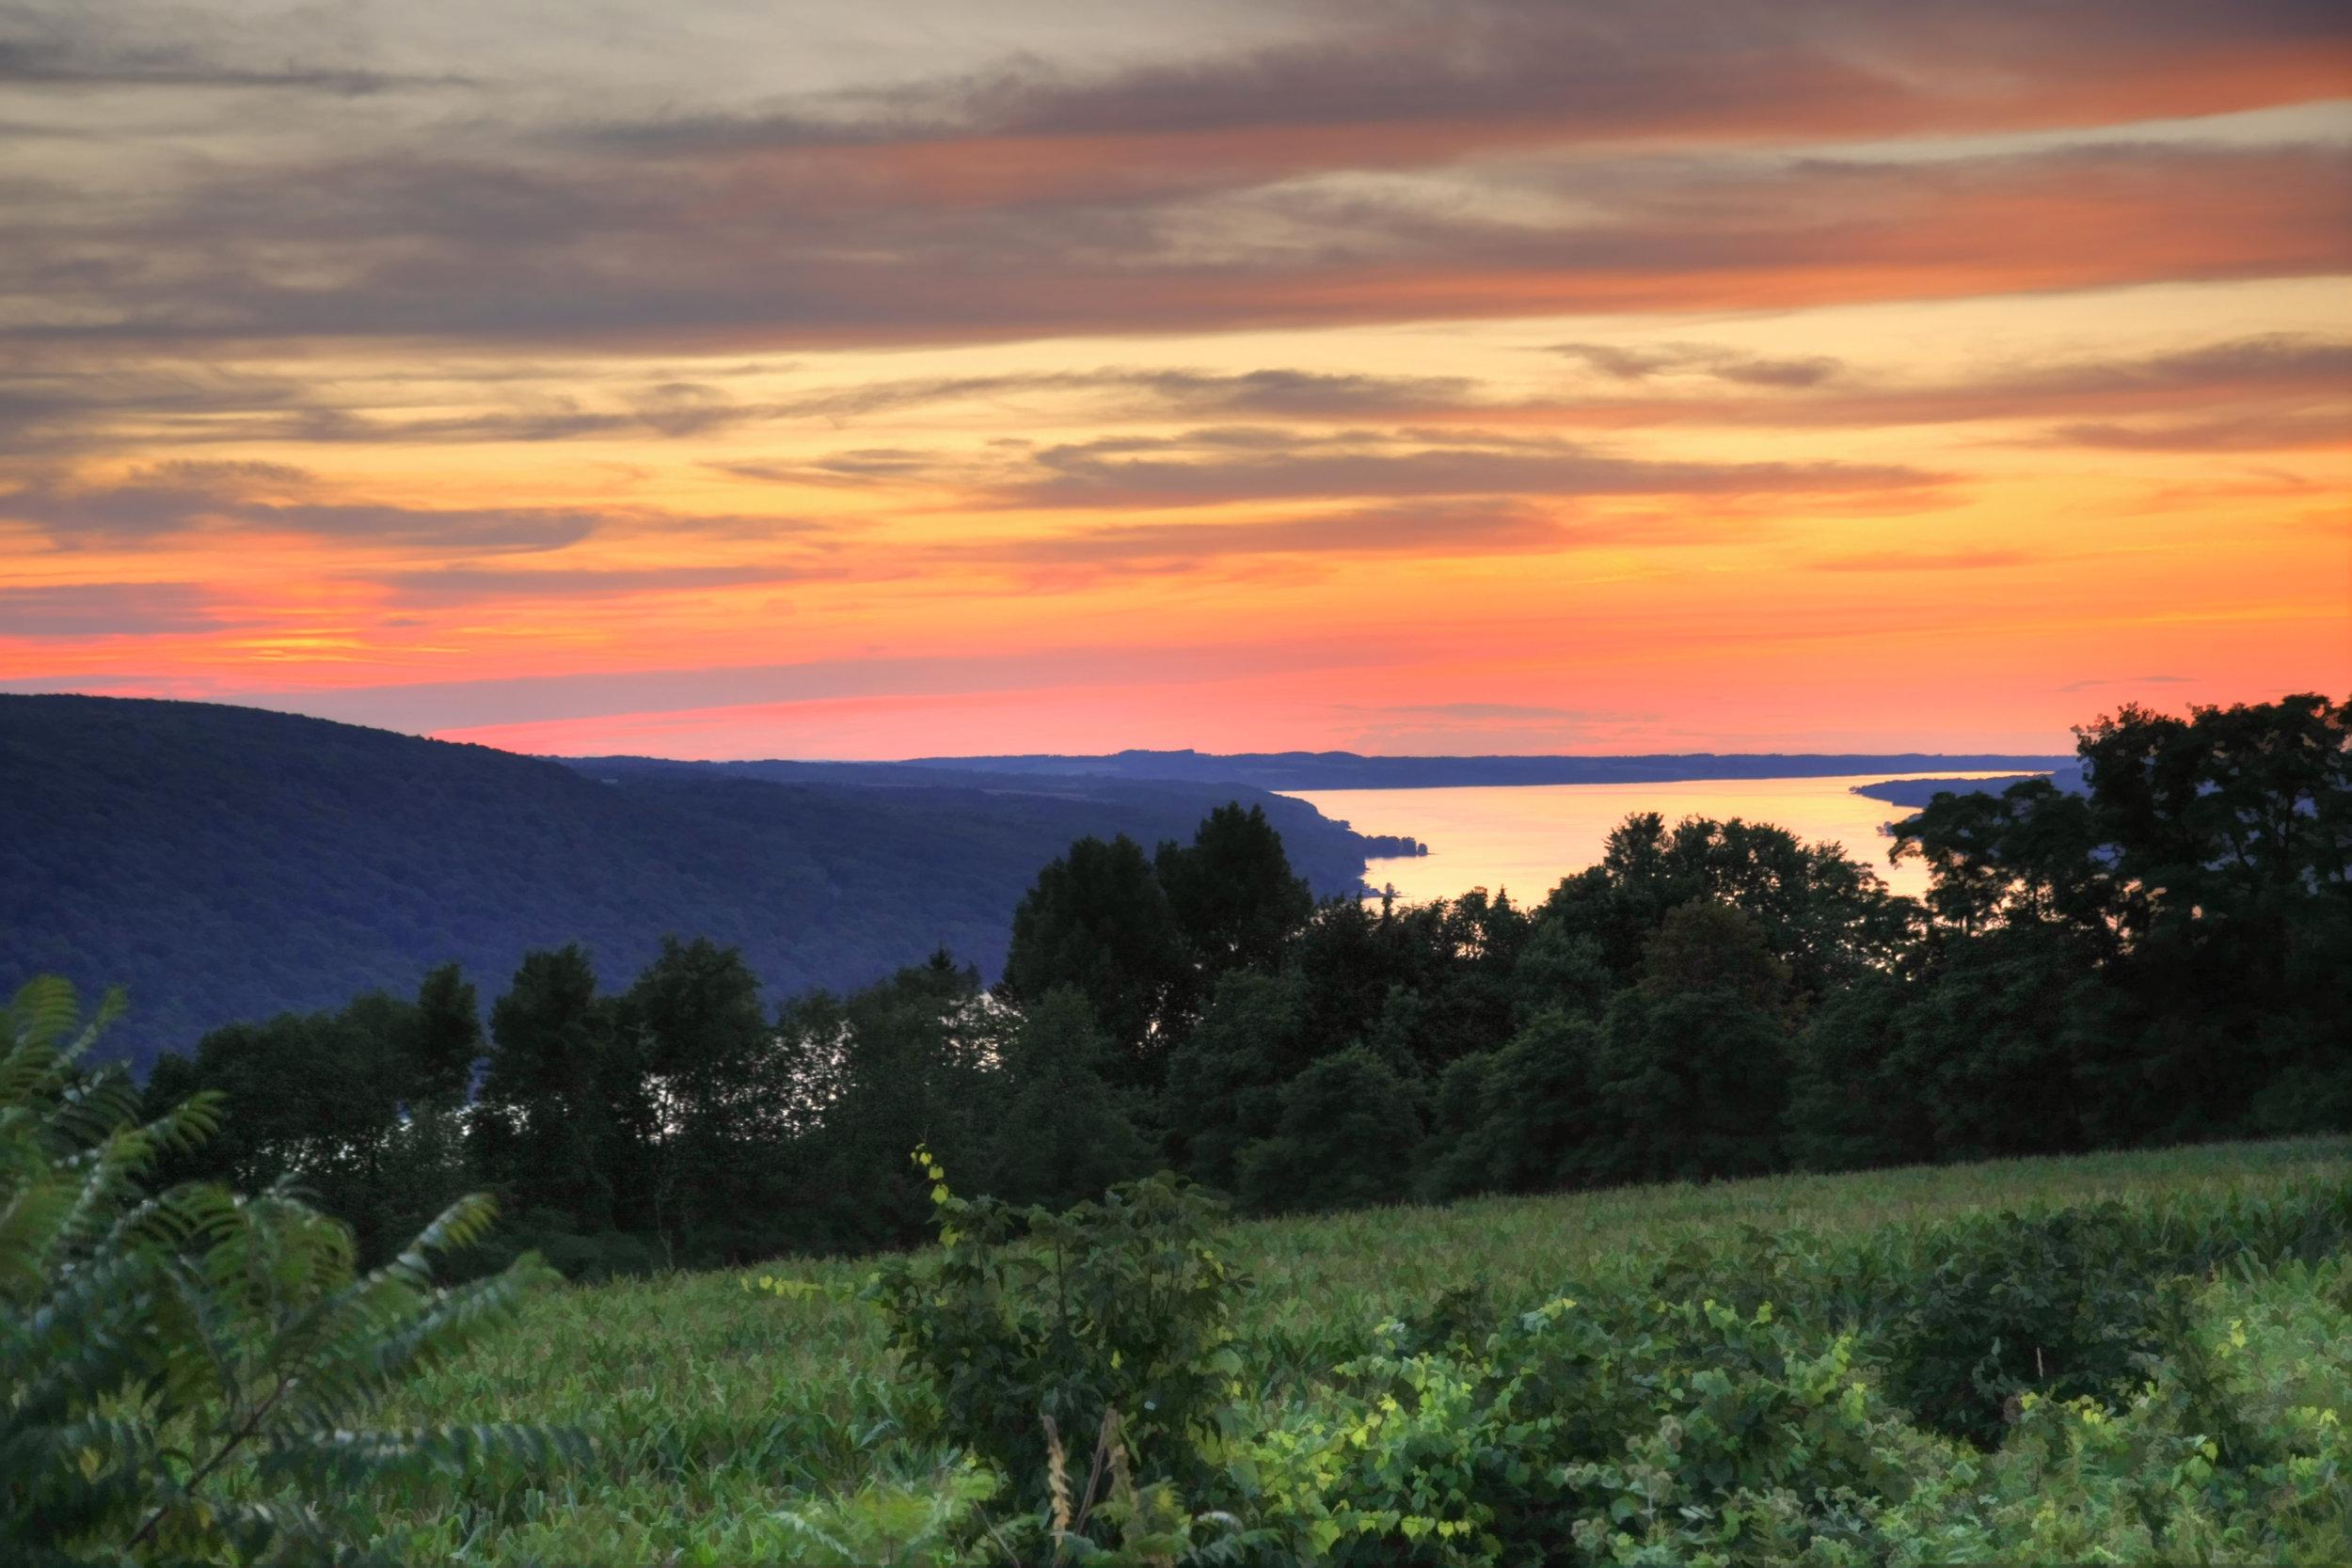 skaneateles+lake+sunset+from+t-1437612701-O.jpg